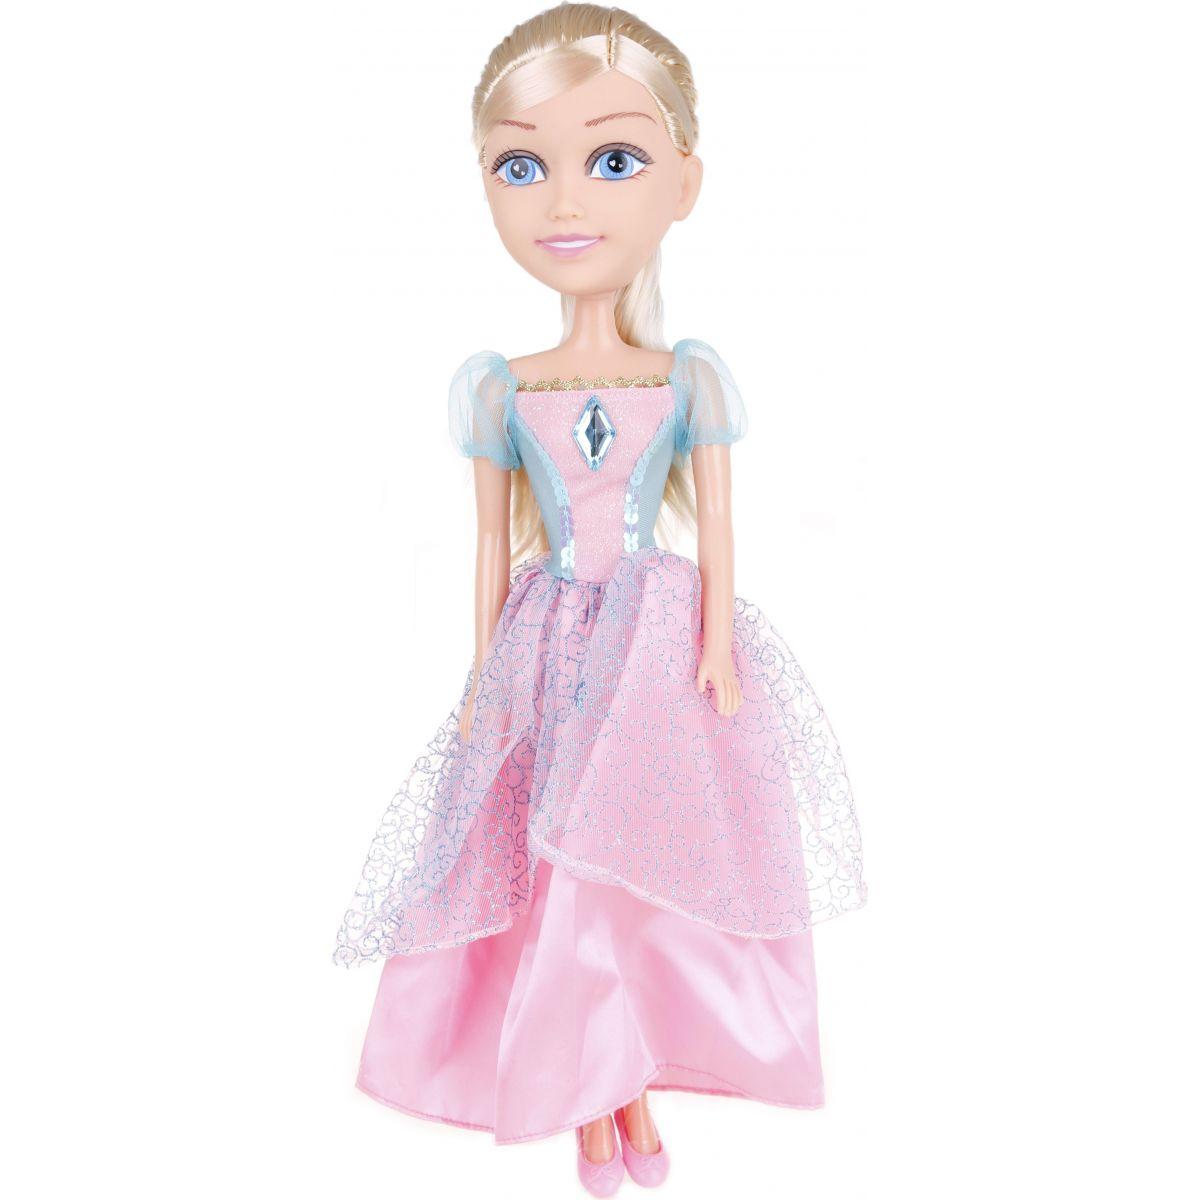 Alltoys Princezna 50 cm Sparkle Girlz - Zeleno - růžové šaty